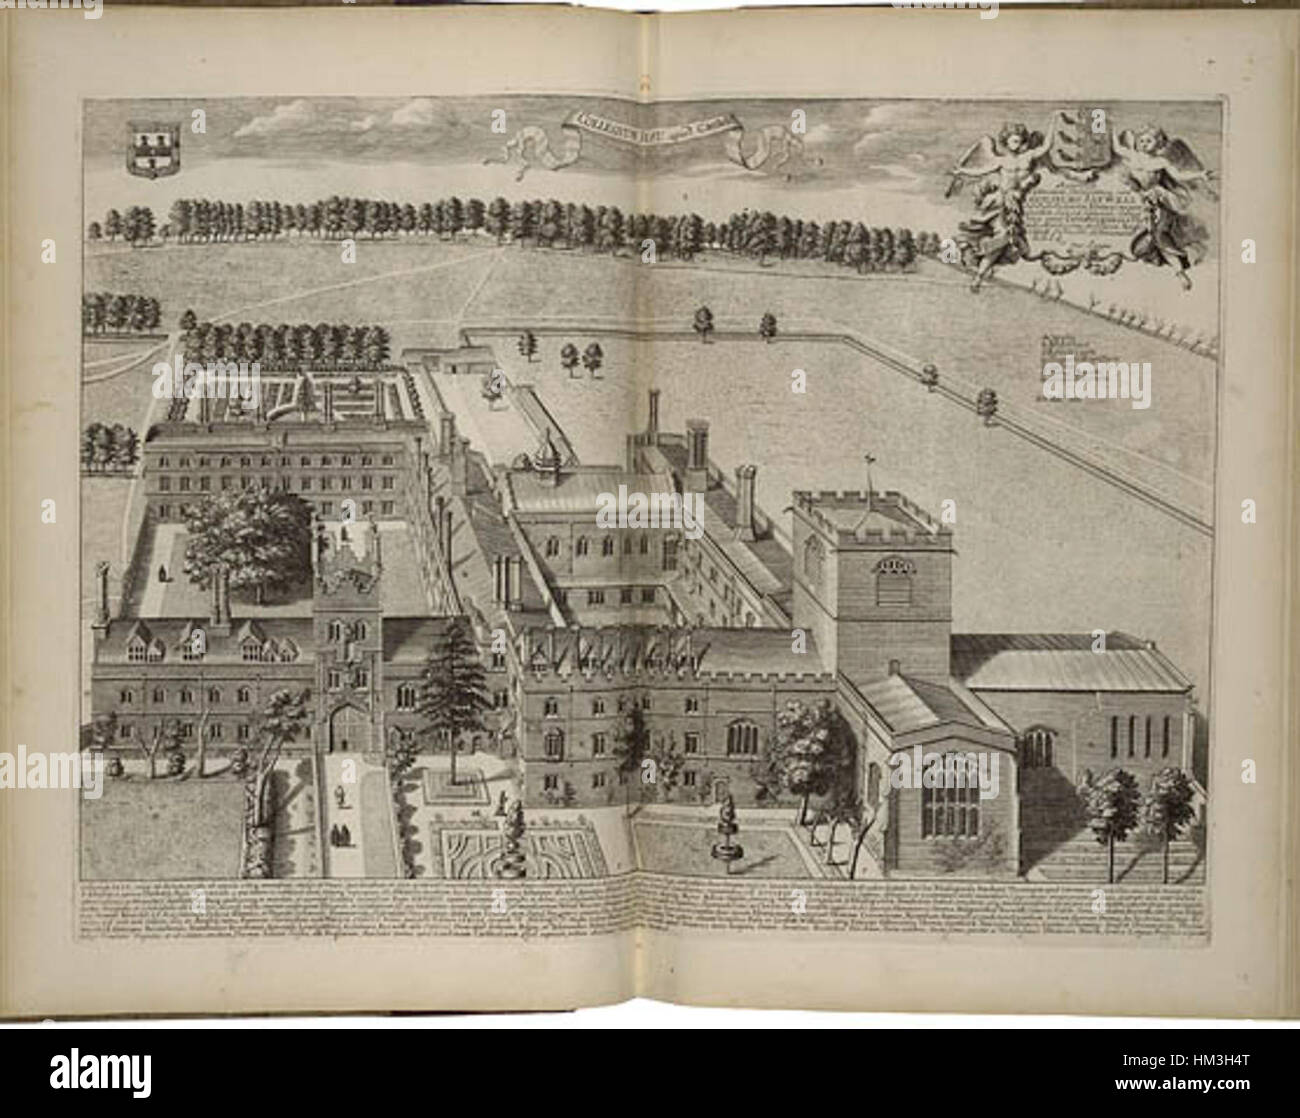 Jesus College, Cambridge by Loggan 1690 - Folger 046539W5 - Stock Image